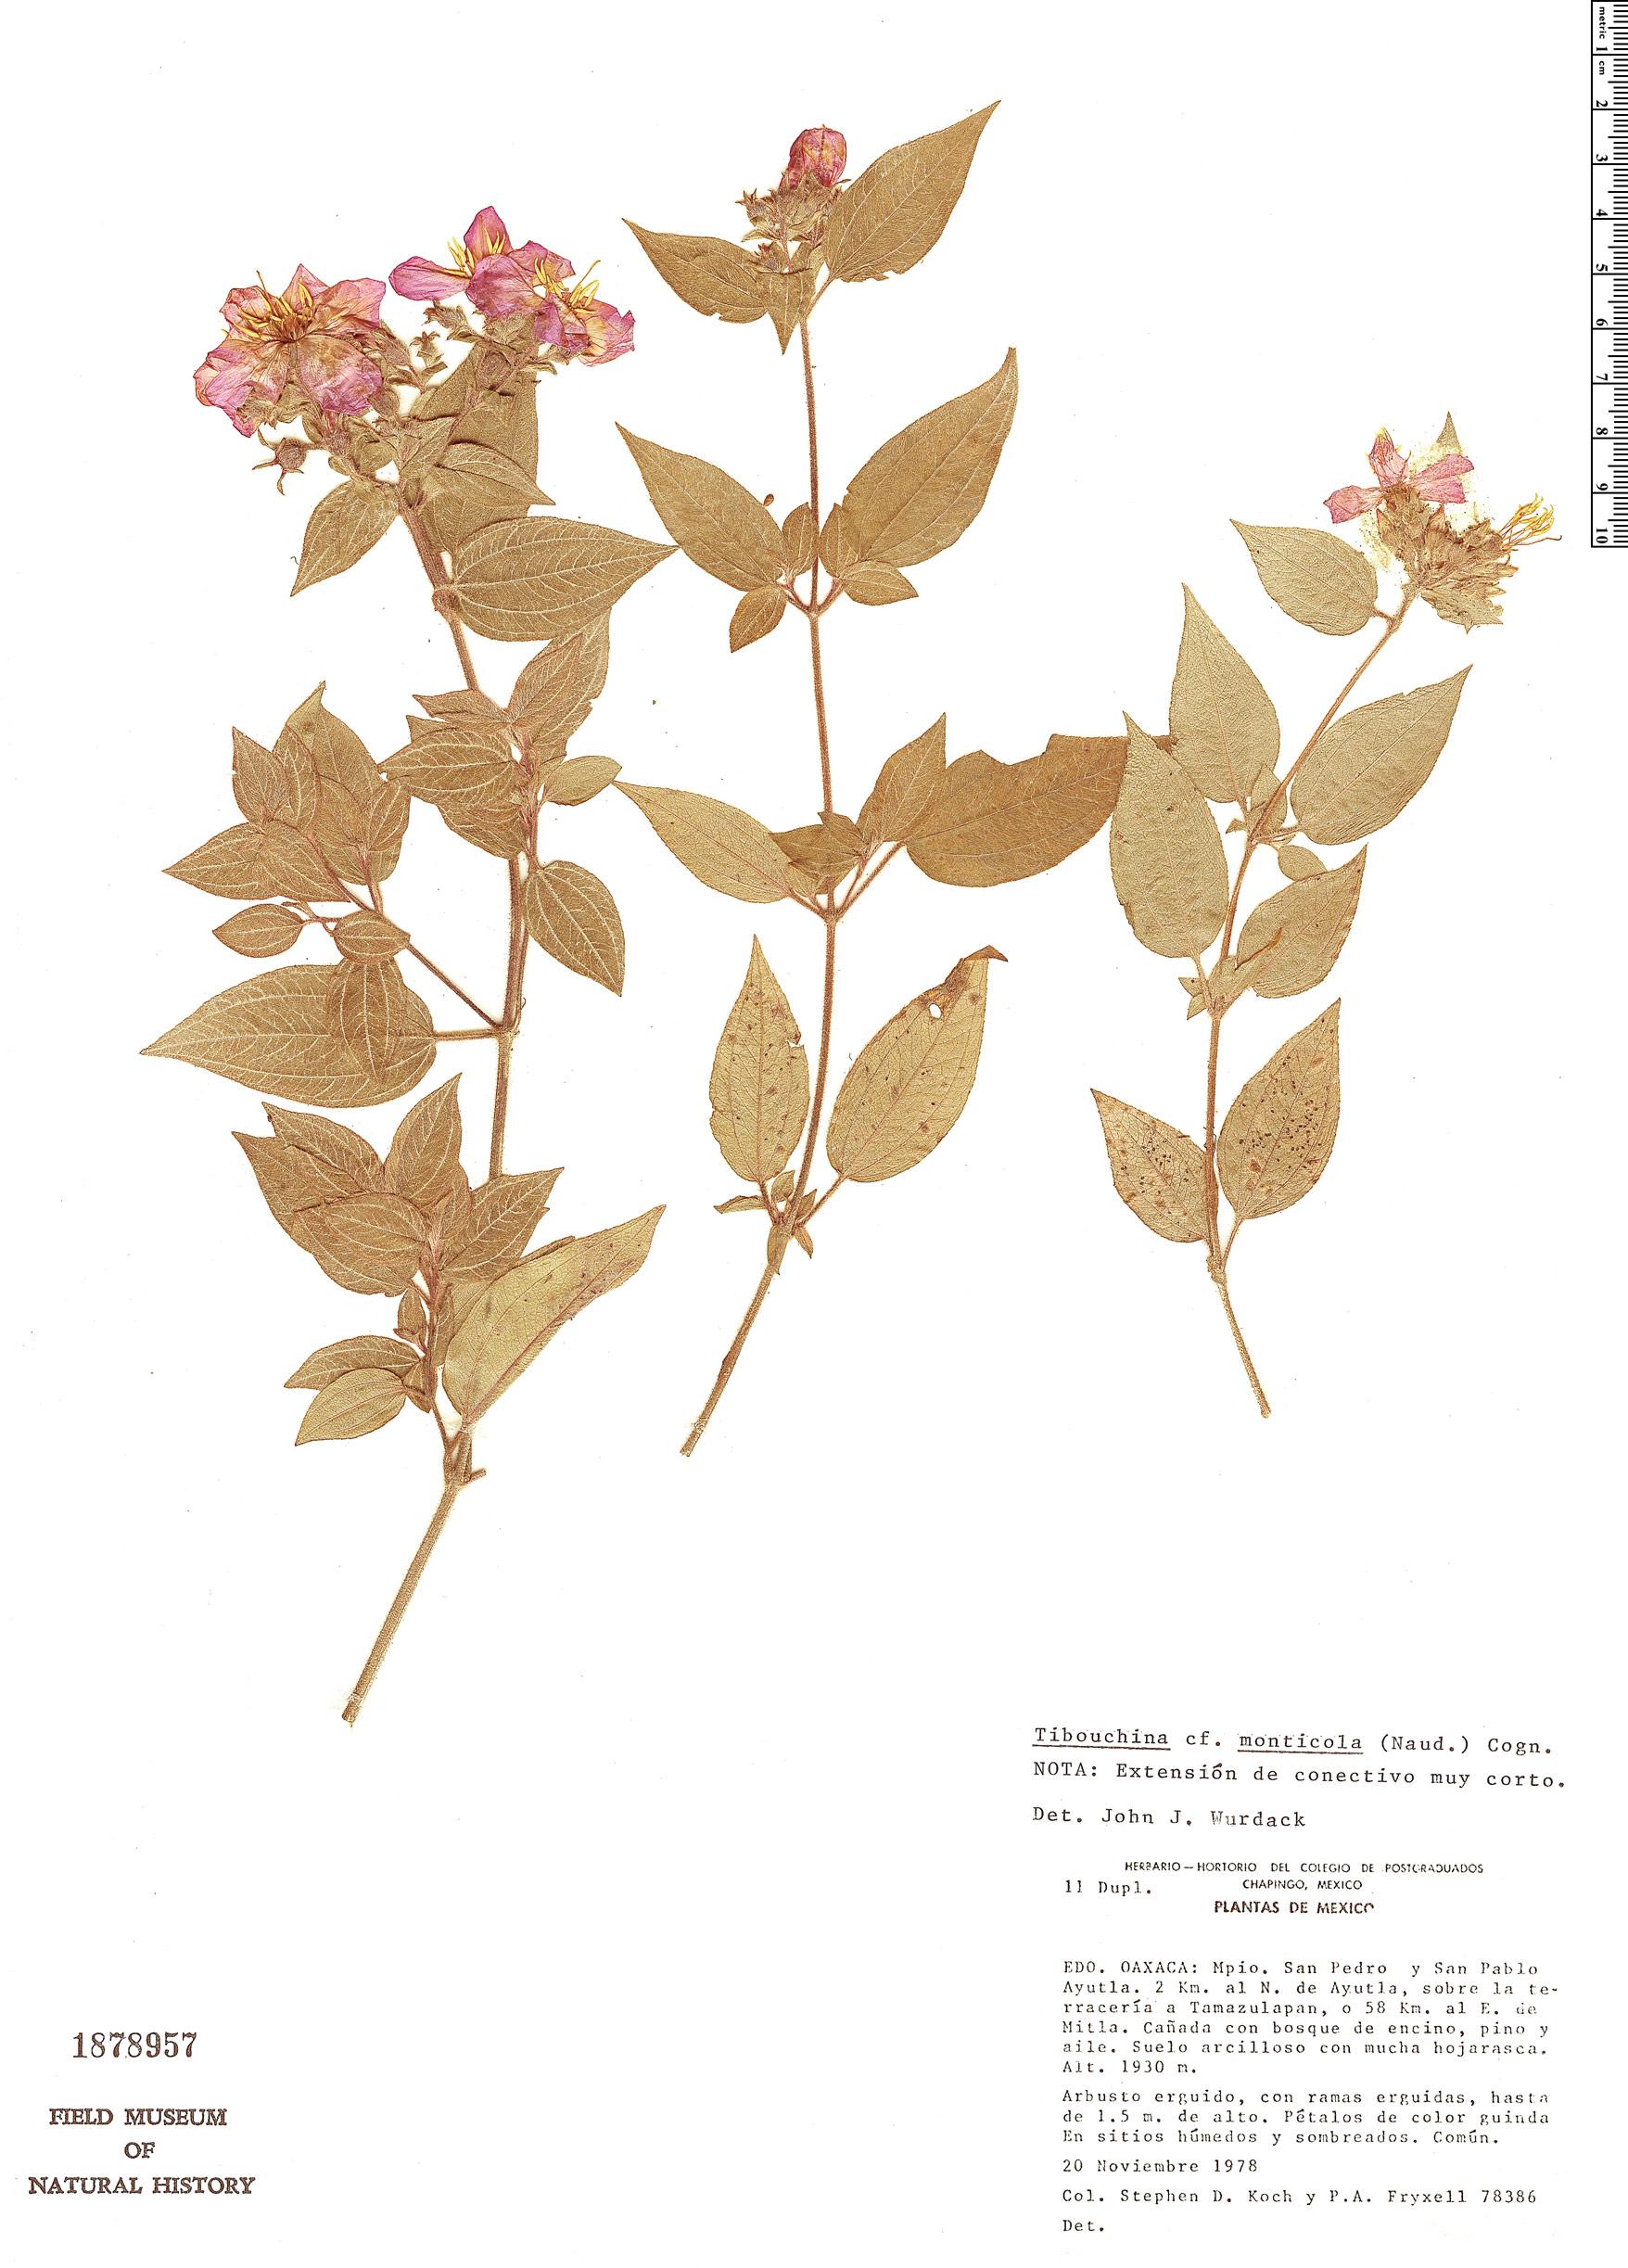 Specimen: Tibouchina monticola